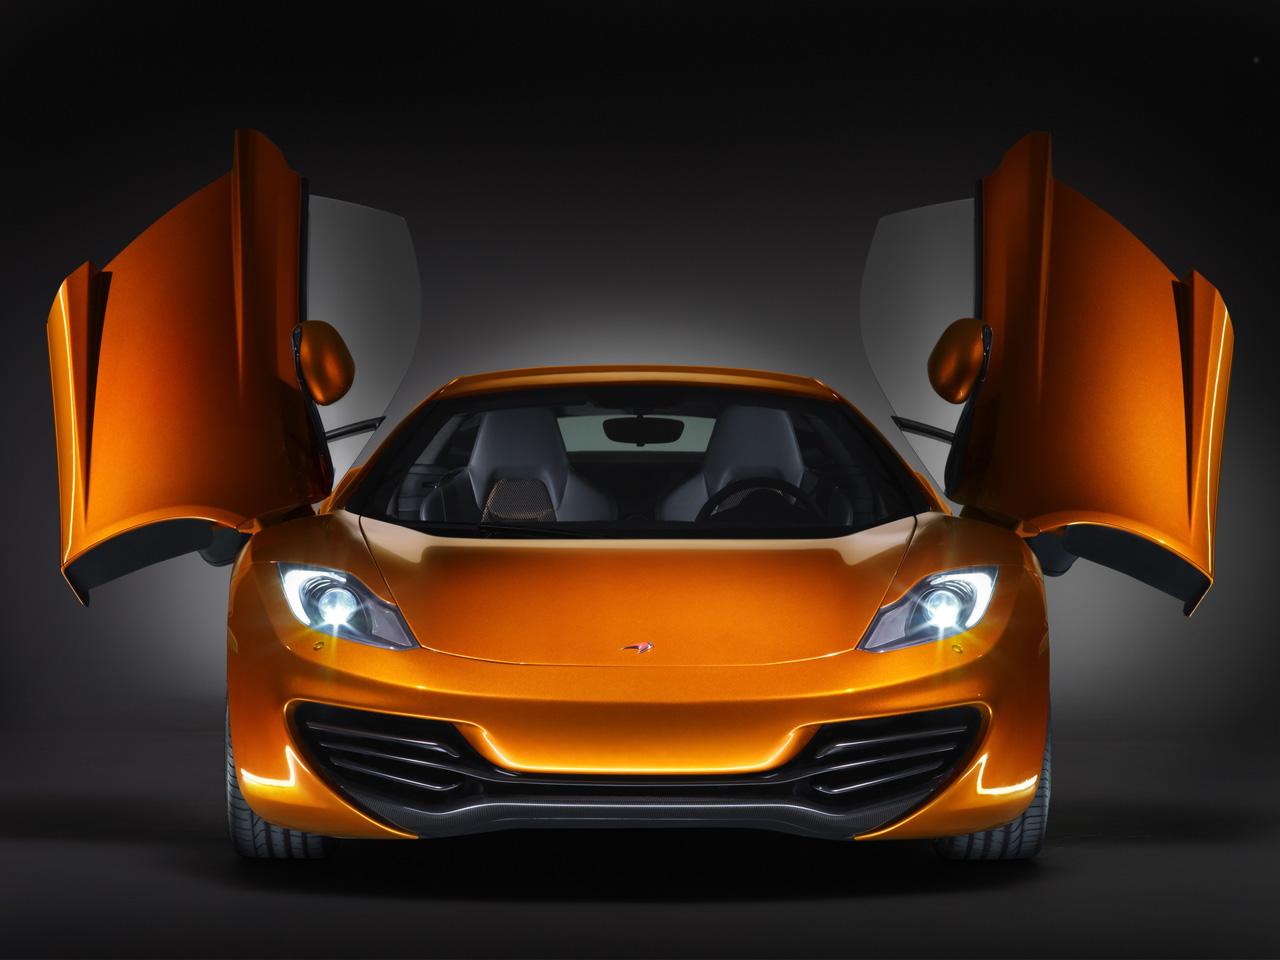 http://2.bp.blogspot.com/_NpeIbAsXPso/TG-42ZnTVCI/AAAAAAAAHTo/bzmf9GyoBv0/s1600/McLaren+MP4-12C+02.jpg